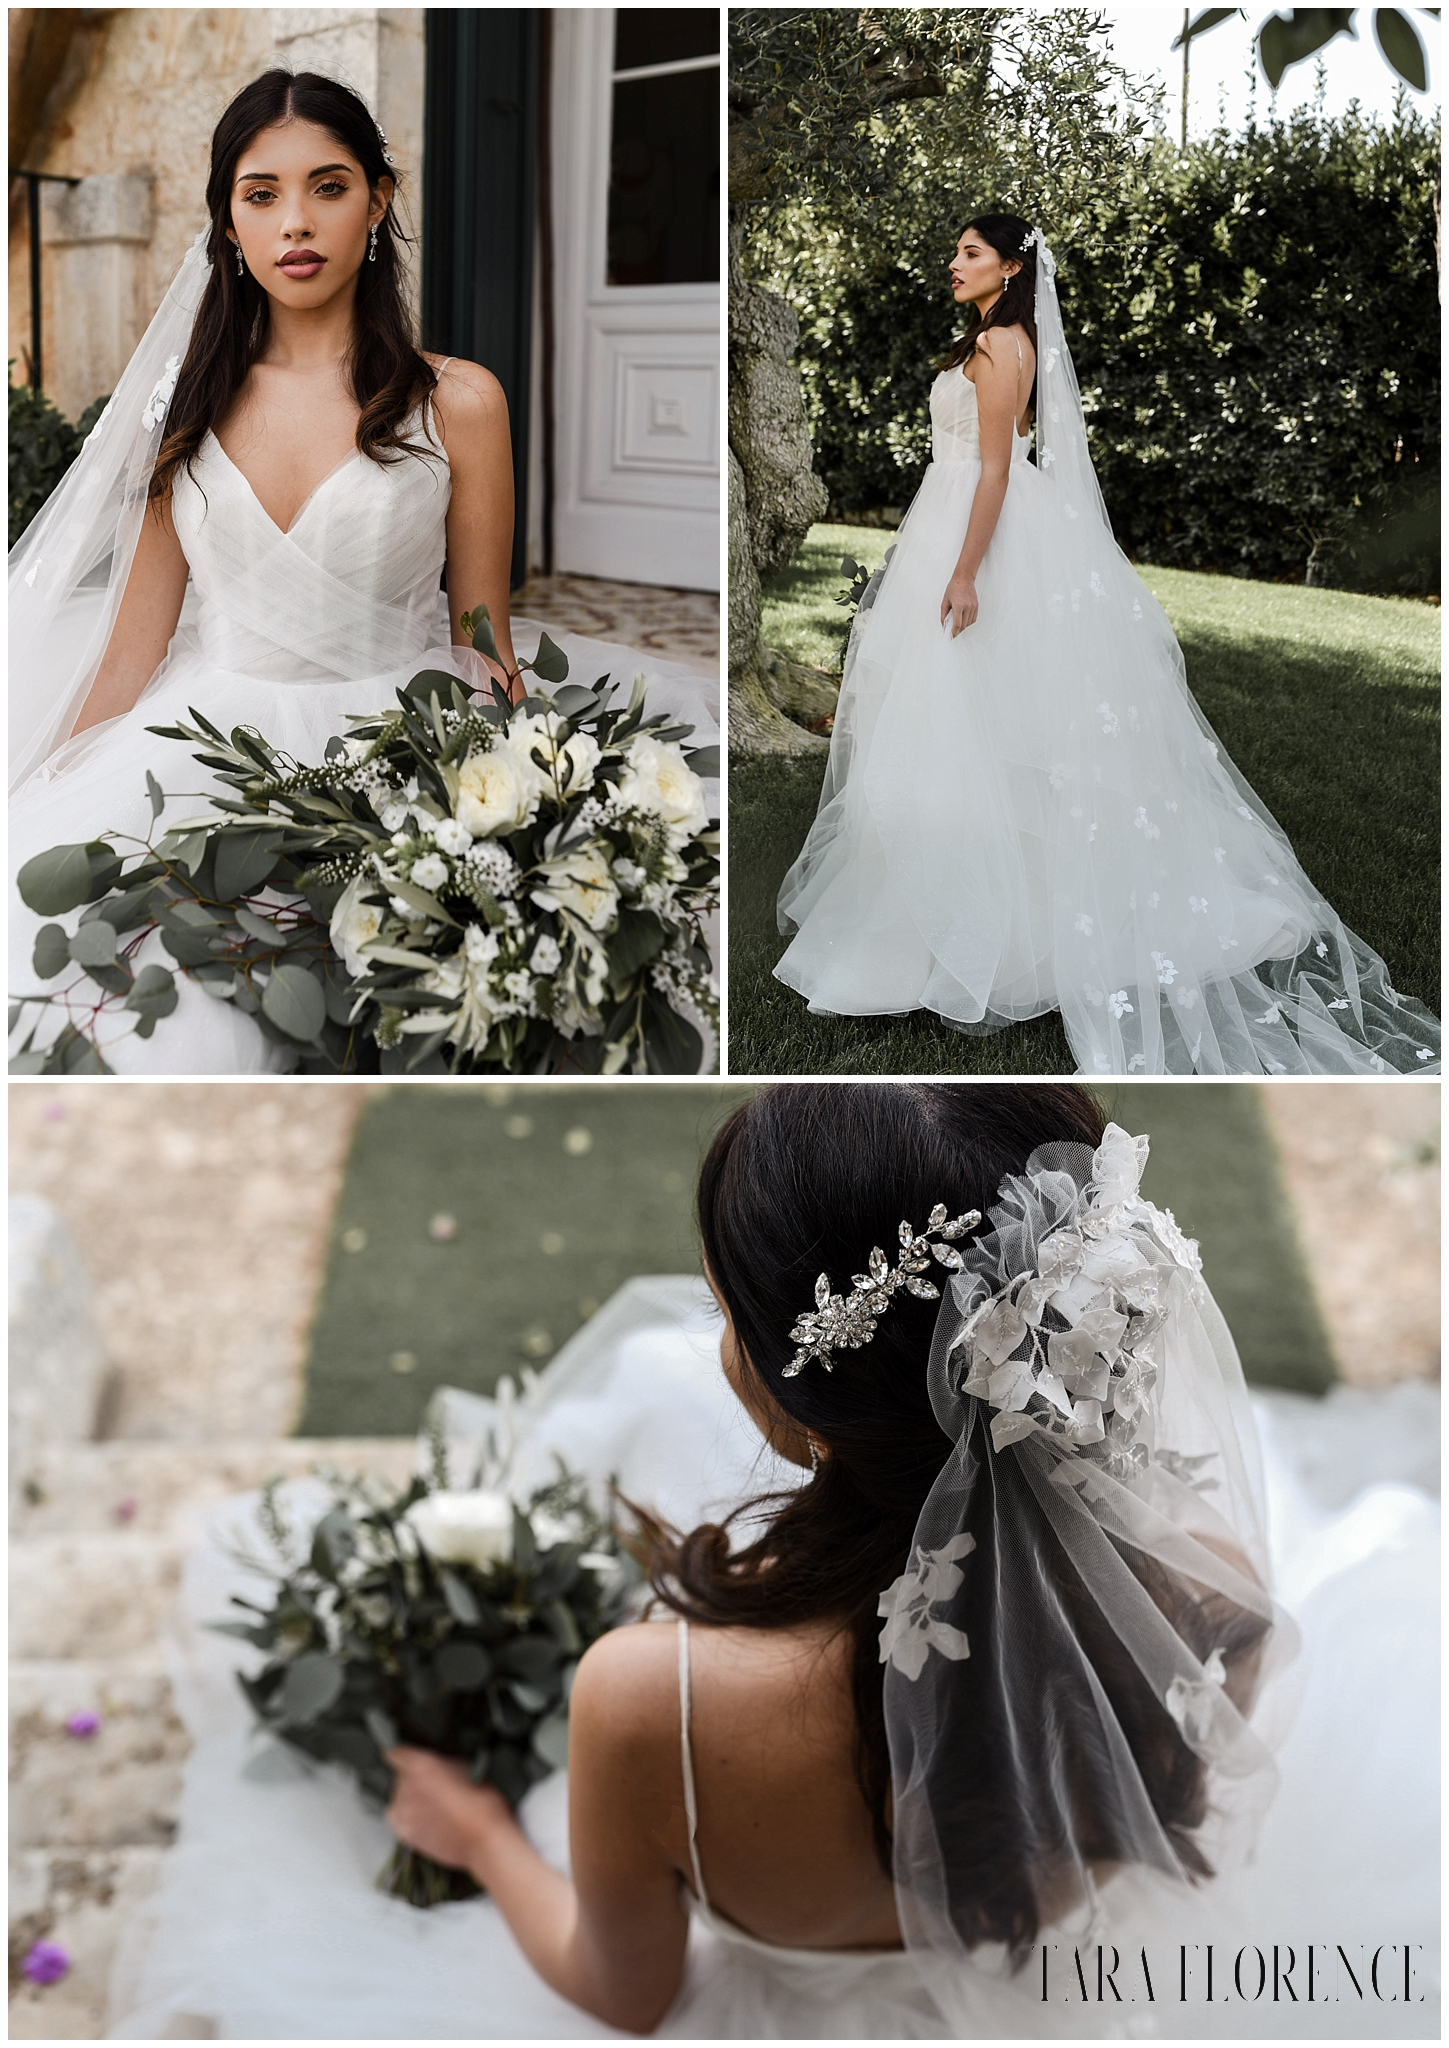 Puglia-Tara-Florence-Bridal-Editorial-131_WEB.jpg